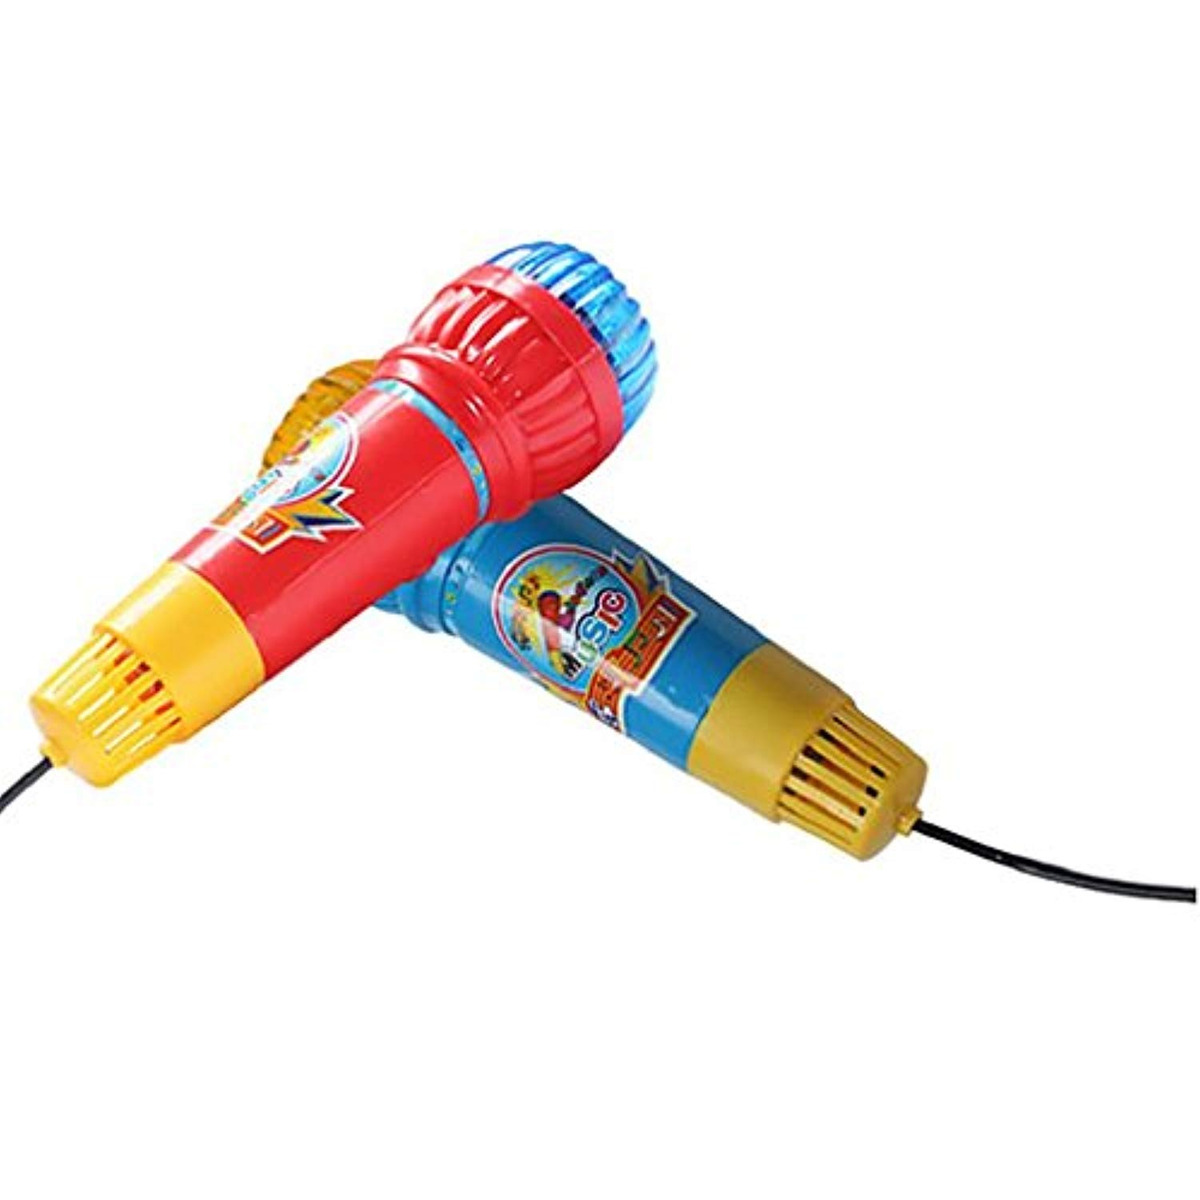 Cocomarket Echo Microphone Mic Voice Changer